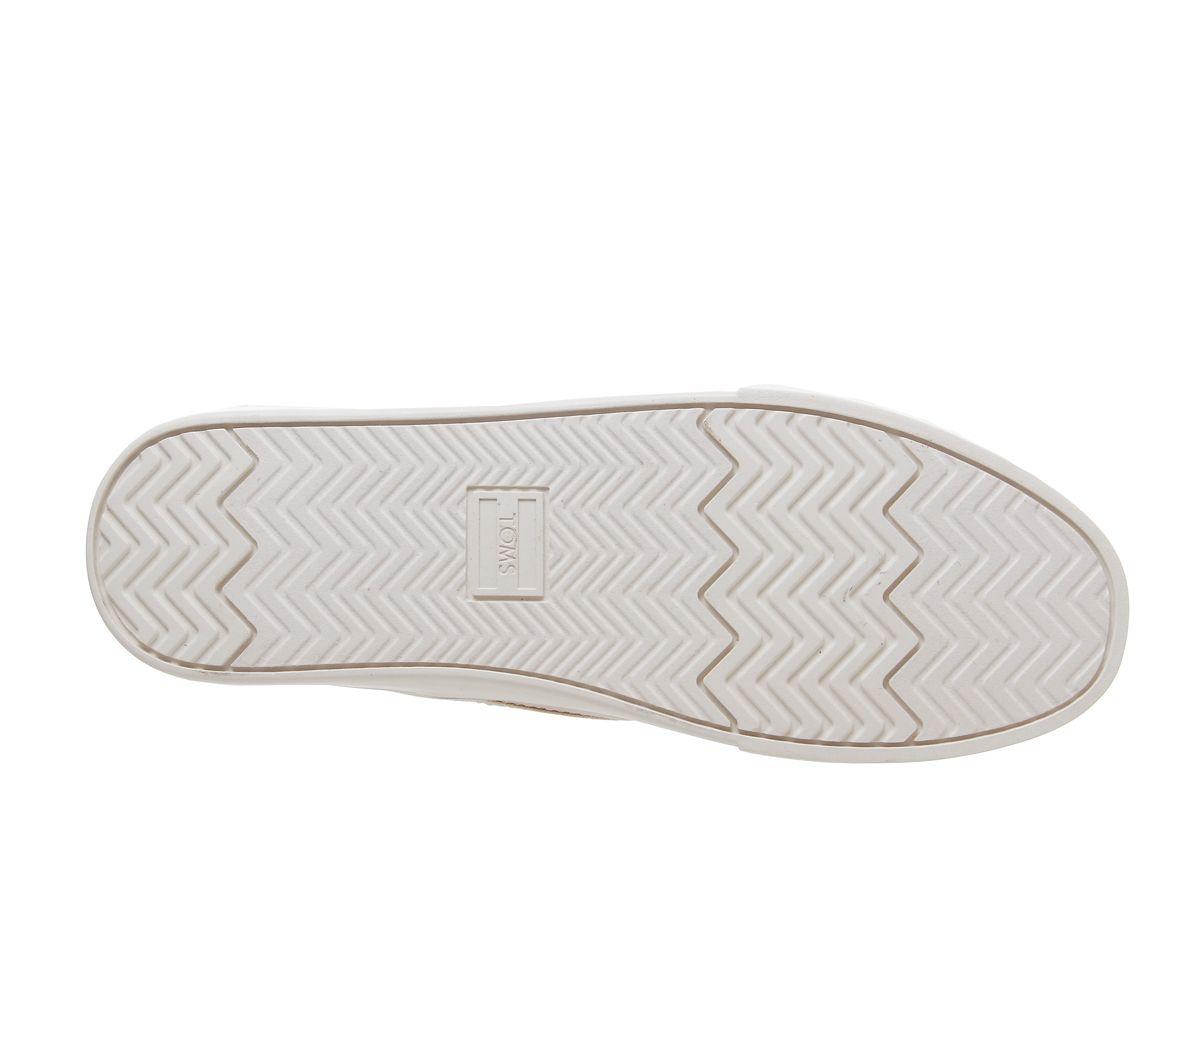 Da-Uomo-Toms-Cordones-Scarpe-da-ginnastica-Naturale-Scarpe-Casual miniatura 6